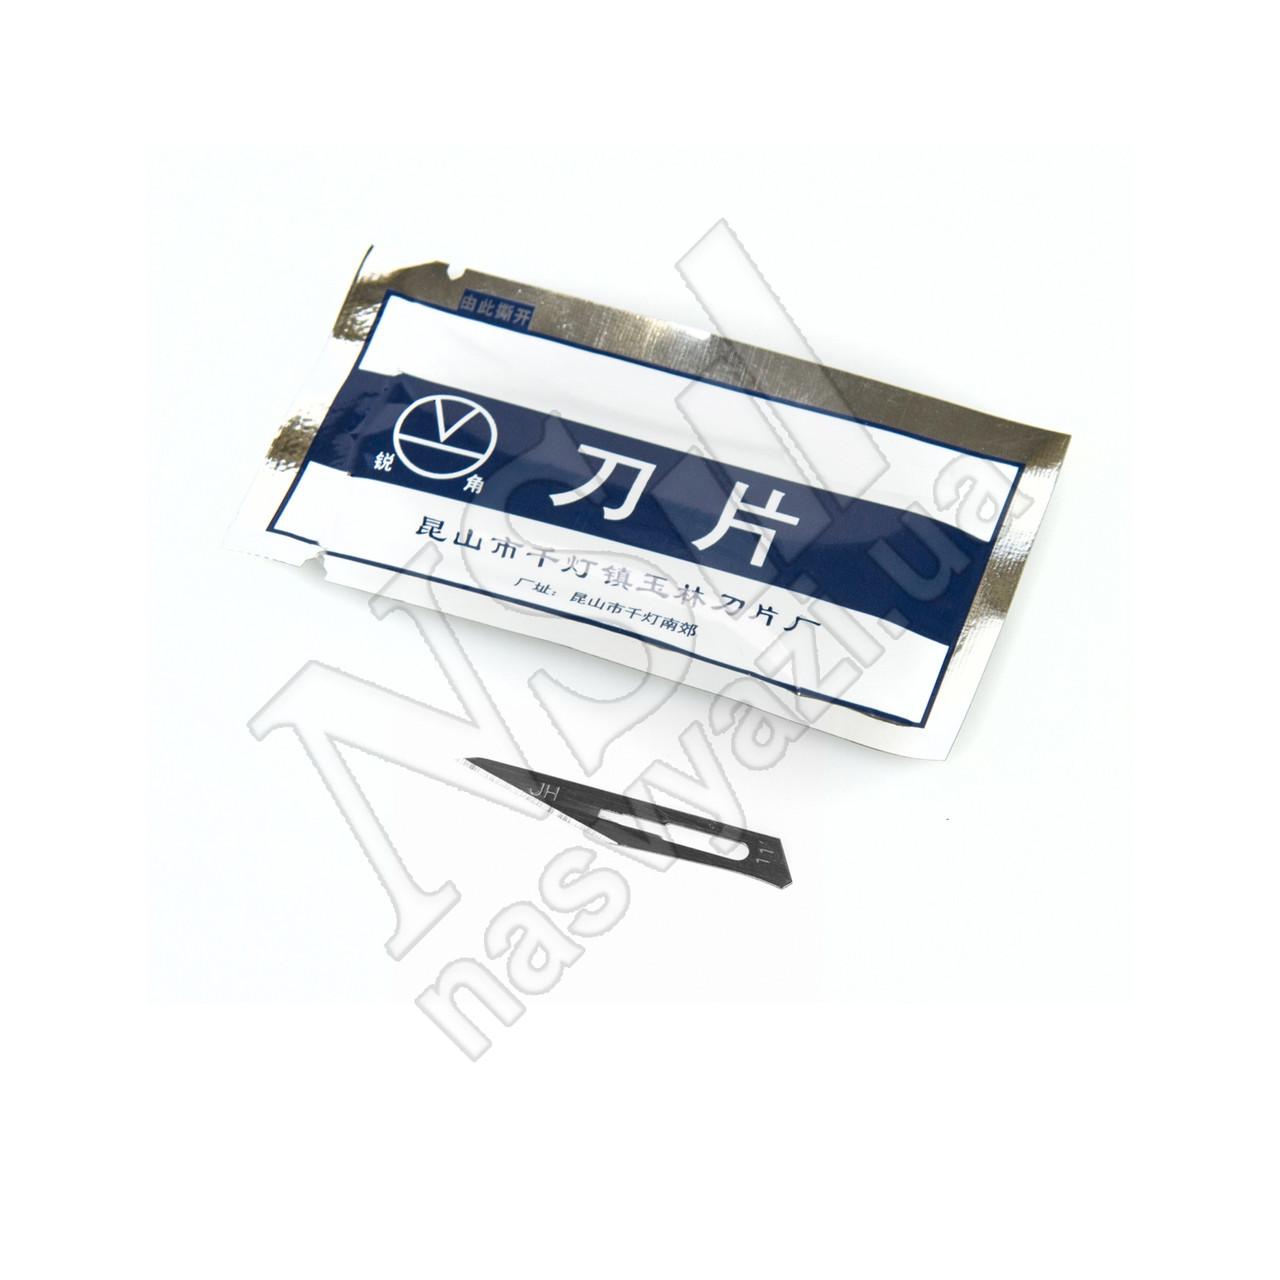 Лезвия скальпеля 11 стандарта (10 шт)